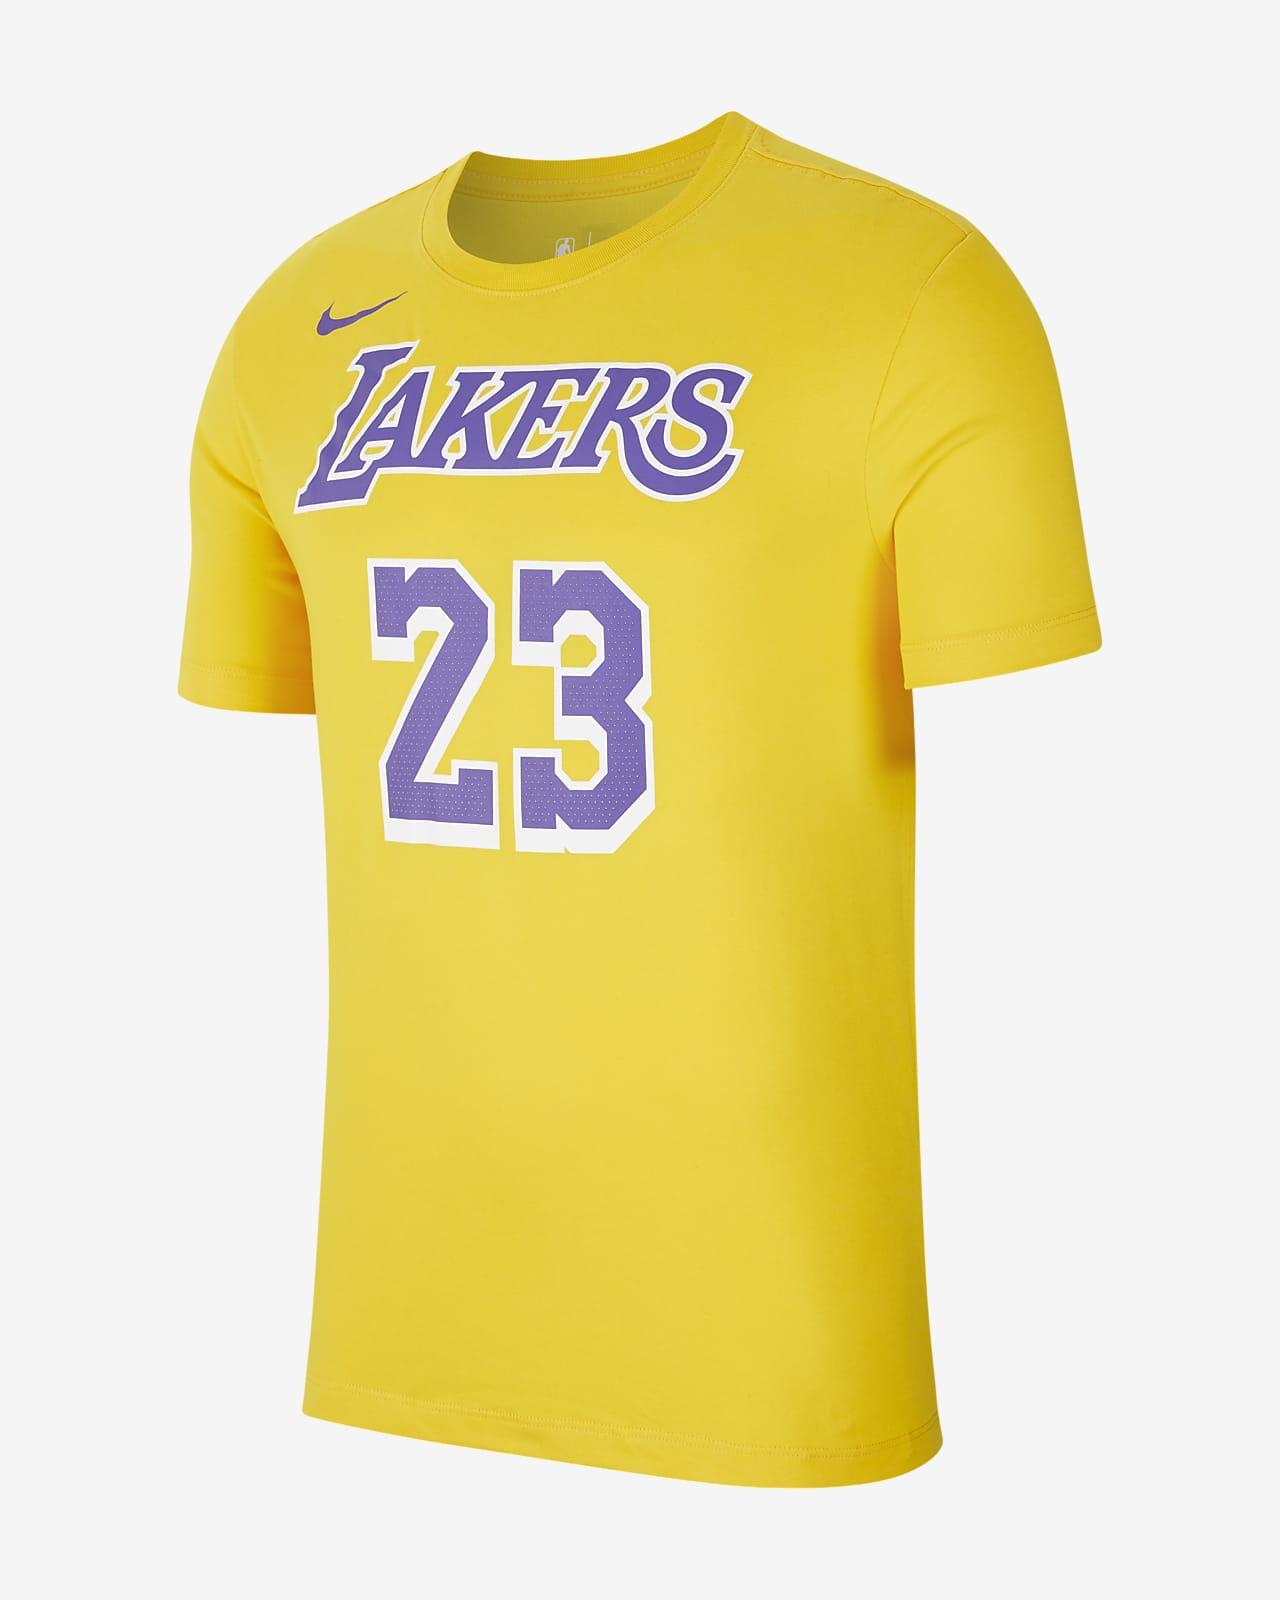 Los Angeles Lakers Men's Nike Dri-FIT NBA T-Shirt